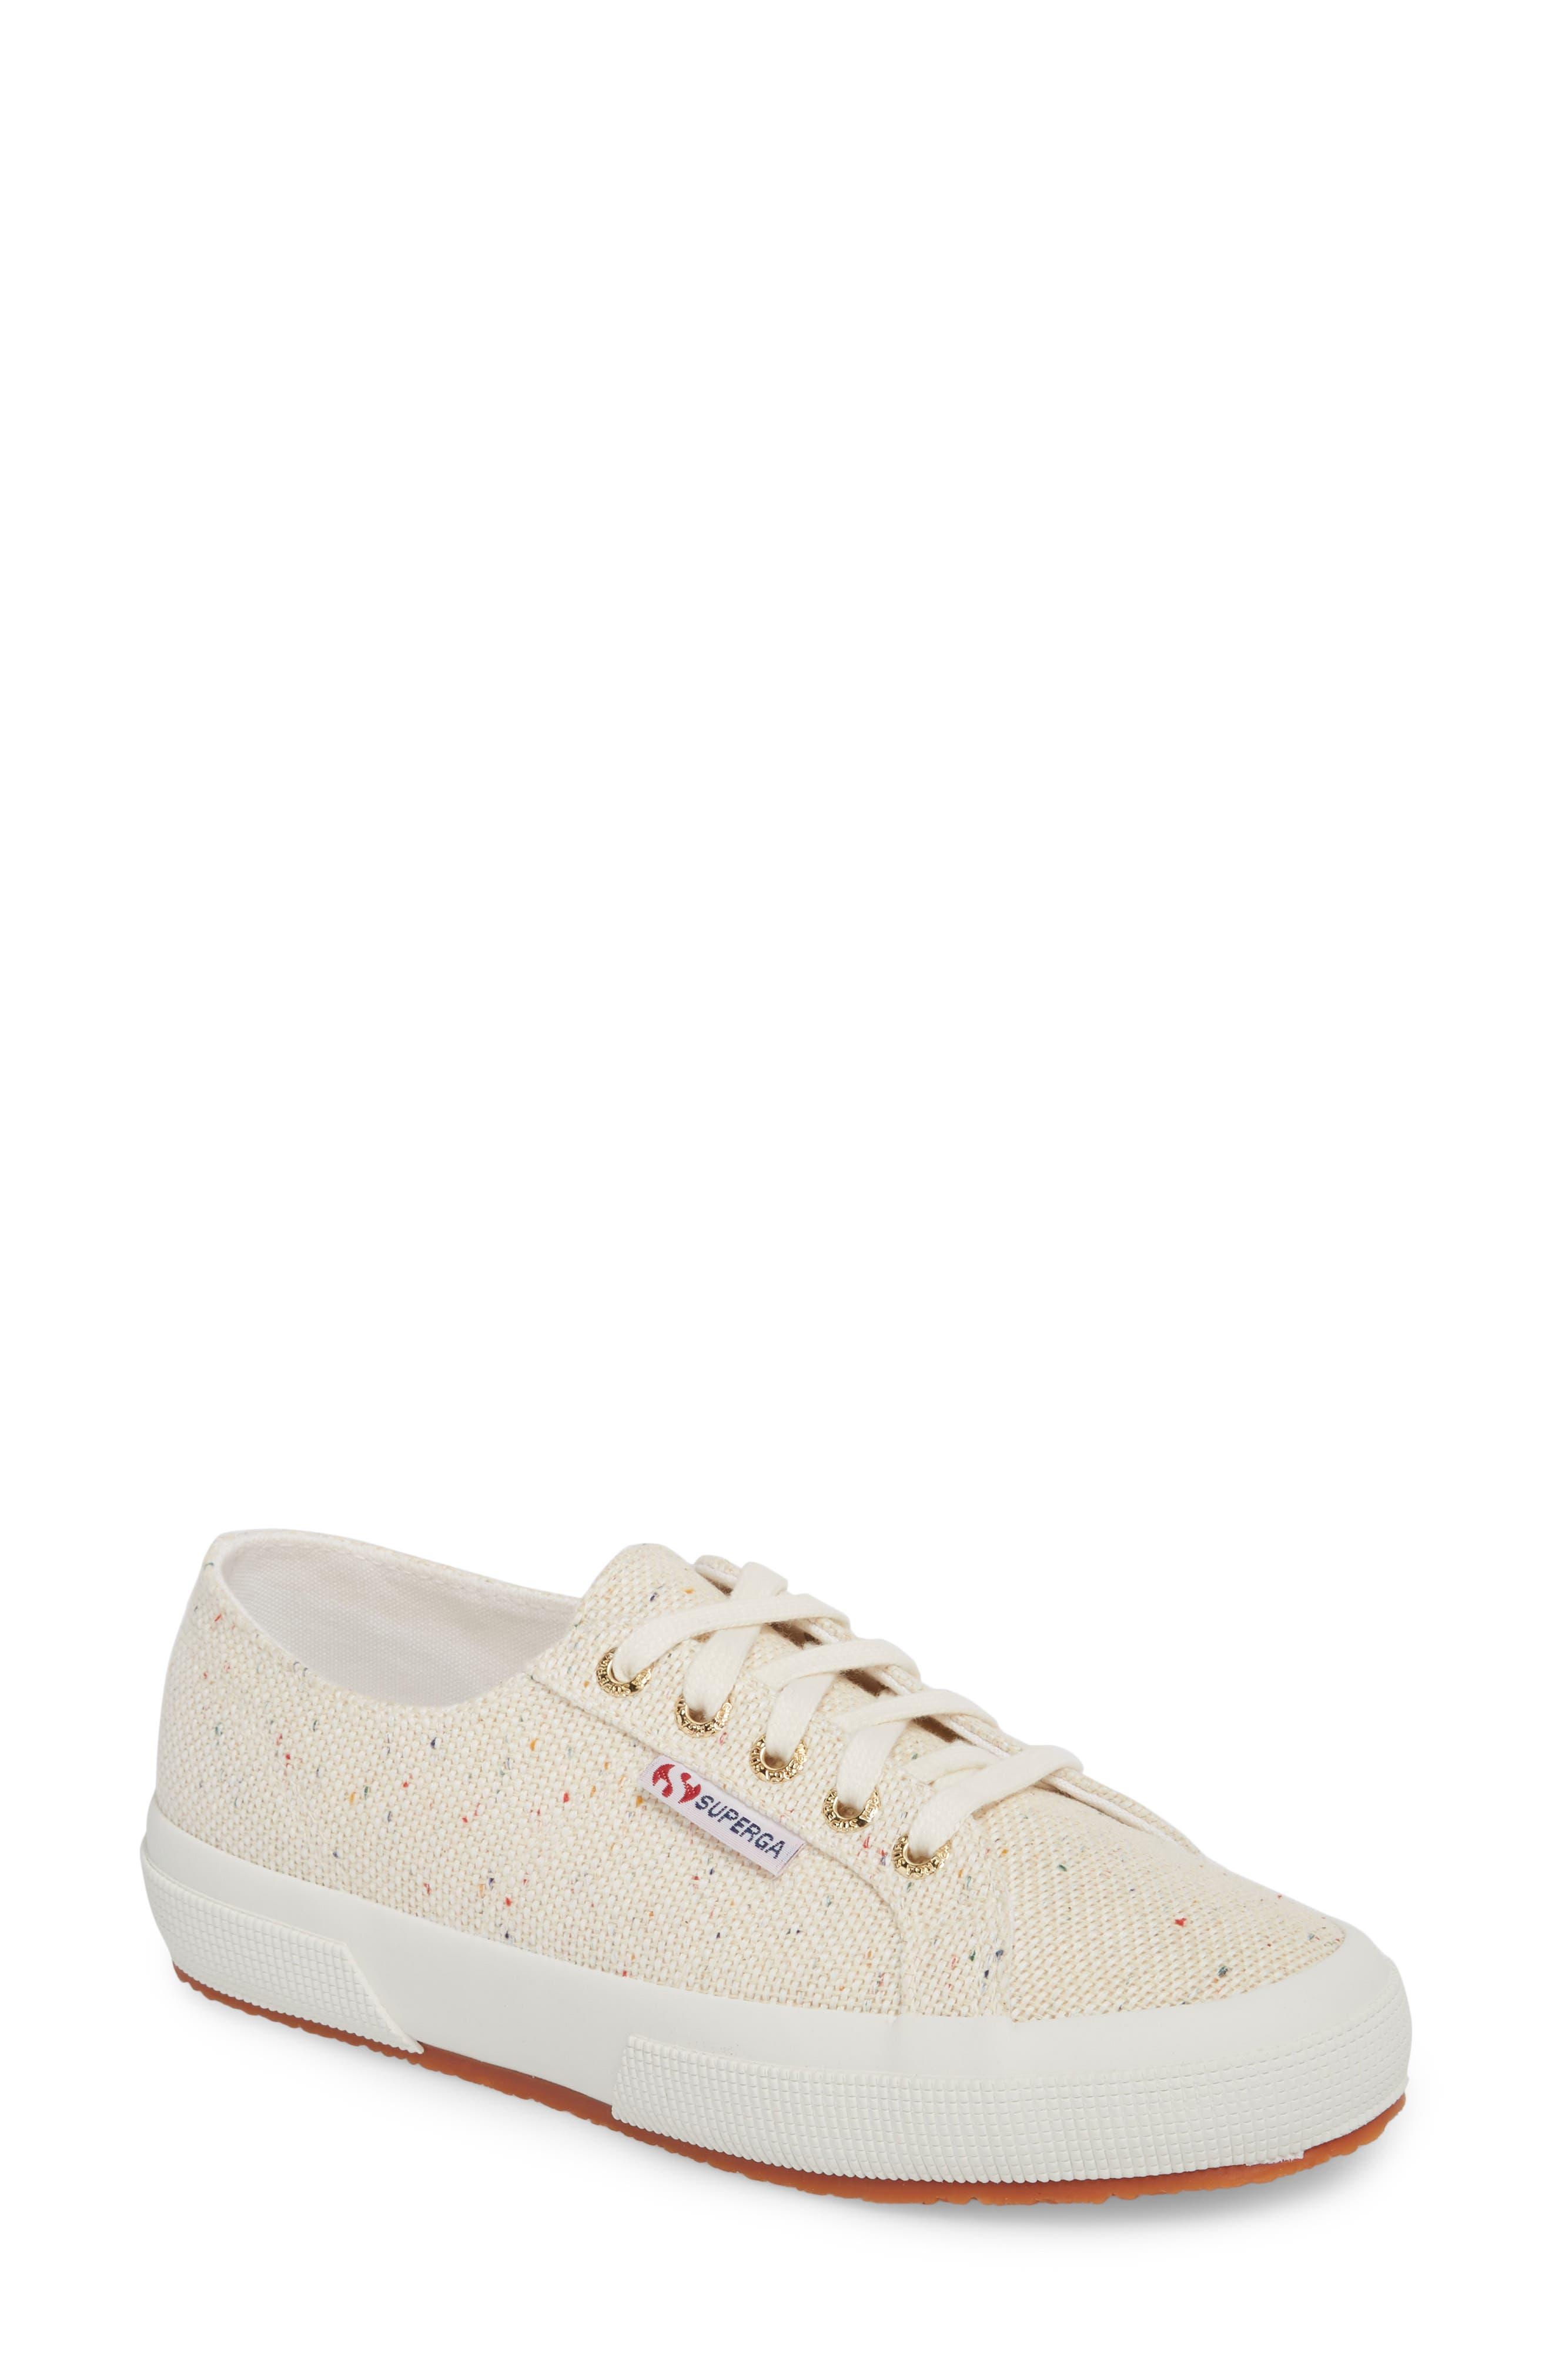 SUPERGA,                             2750 Speckle Low Top Sneaker,                             Main thumbnail 1, color,                             900